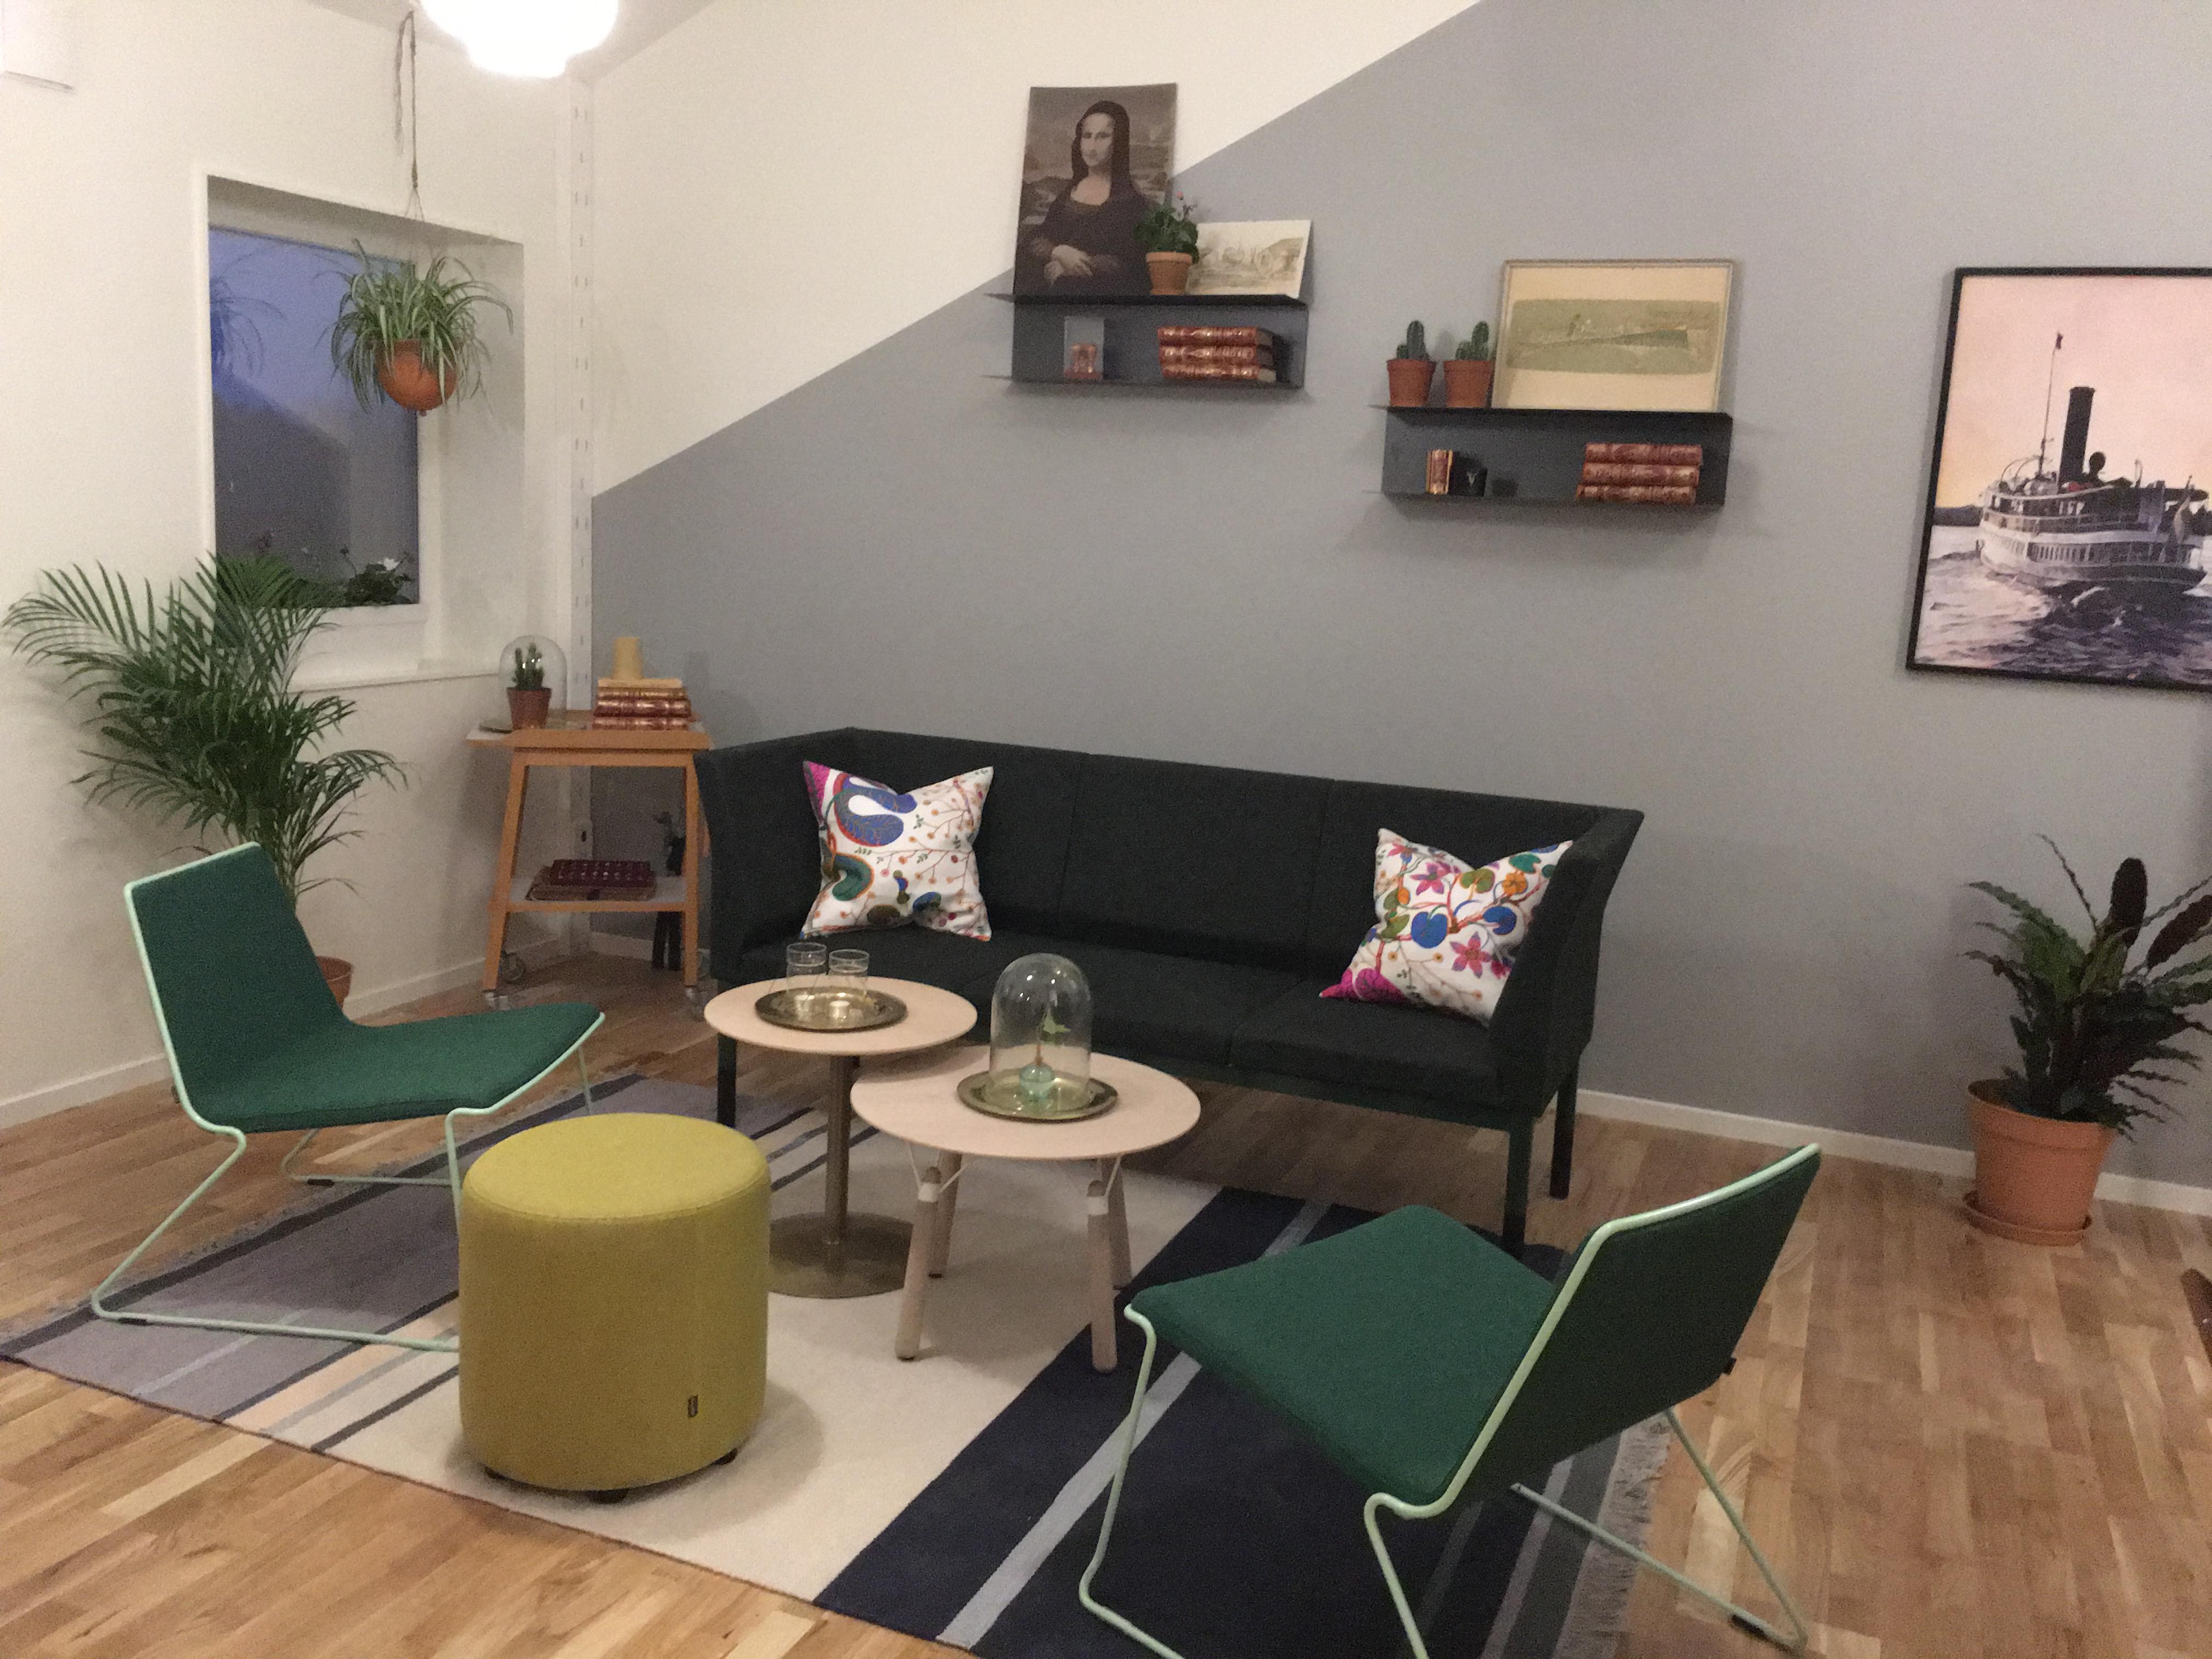 Hus utan sladd - Wenngarn vardagsrummet